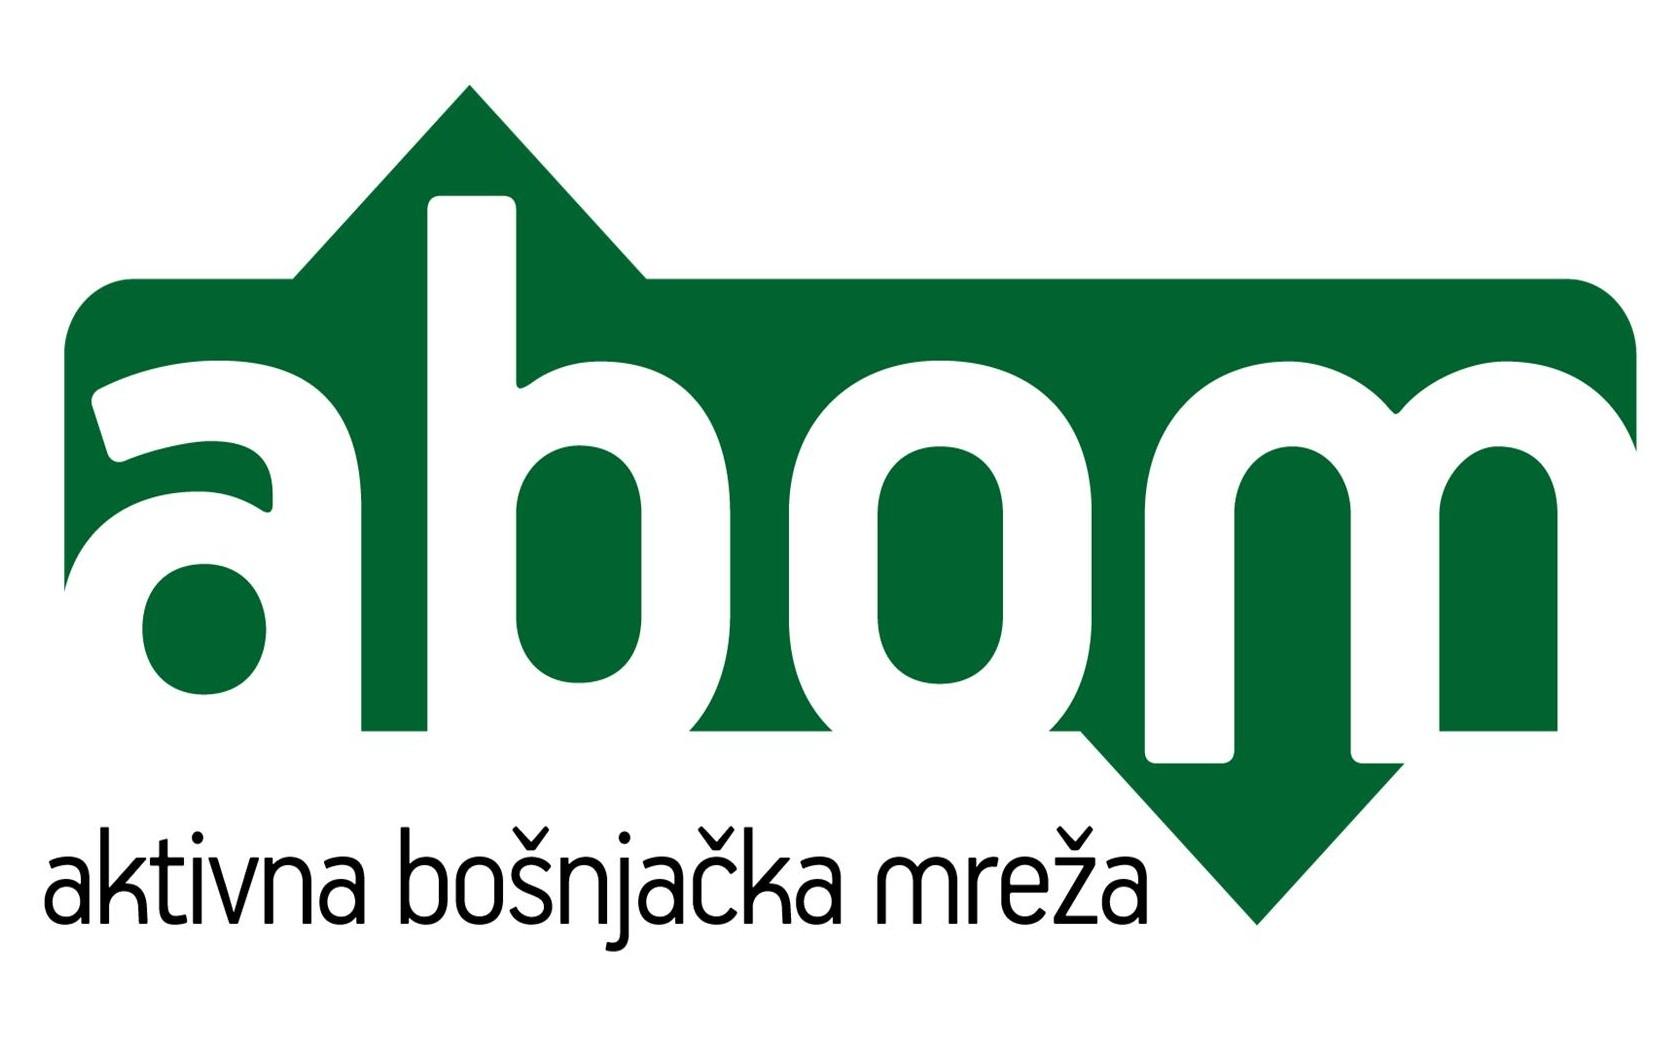 AKTIVNA-BOSNJACKA-MREZAlogo3-e1369655498464